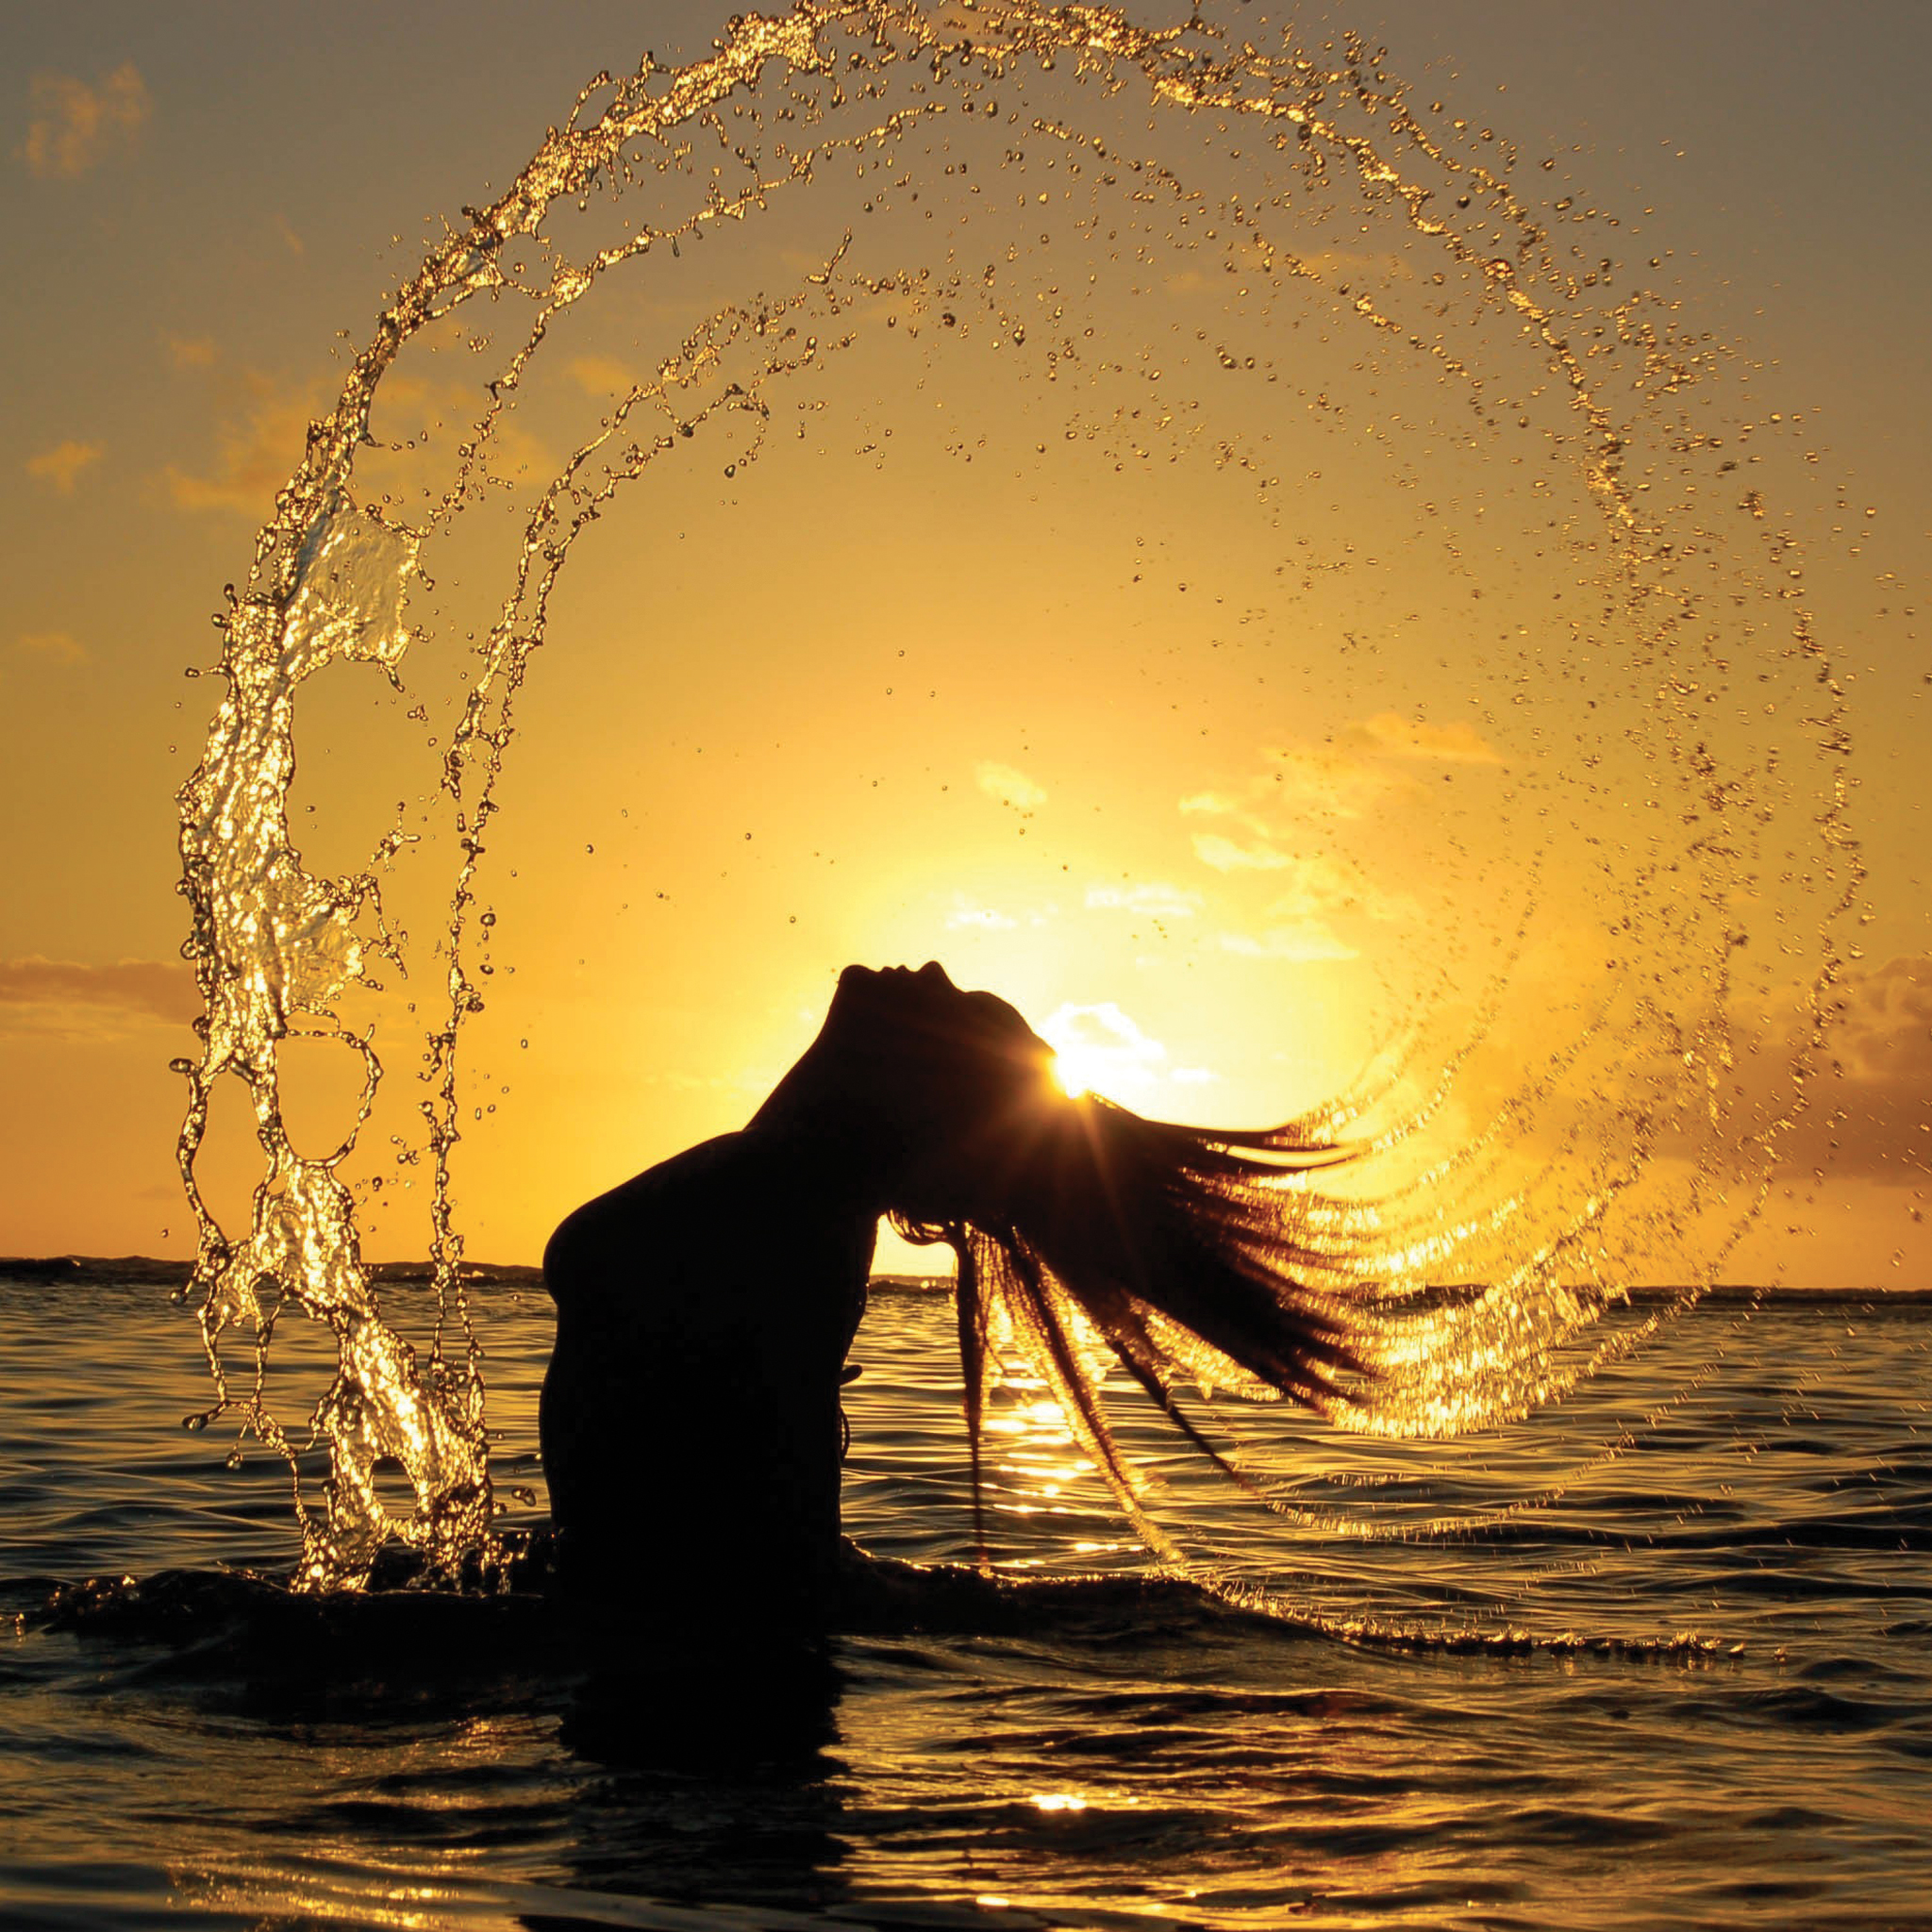 Girl-on-Sunshine-Water-3Wallpapers-iPad-Retina